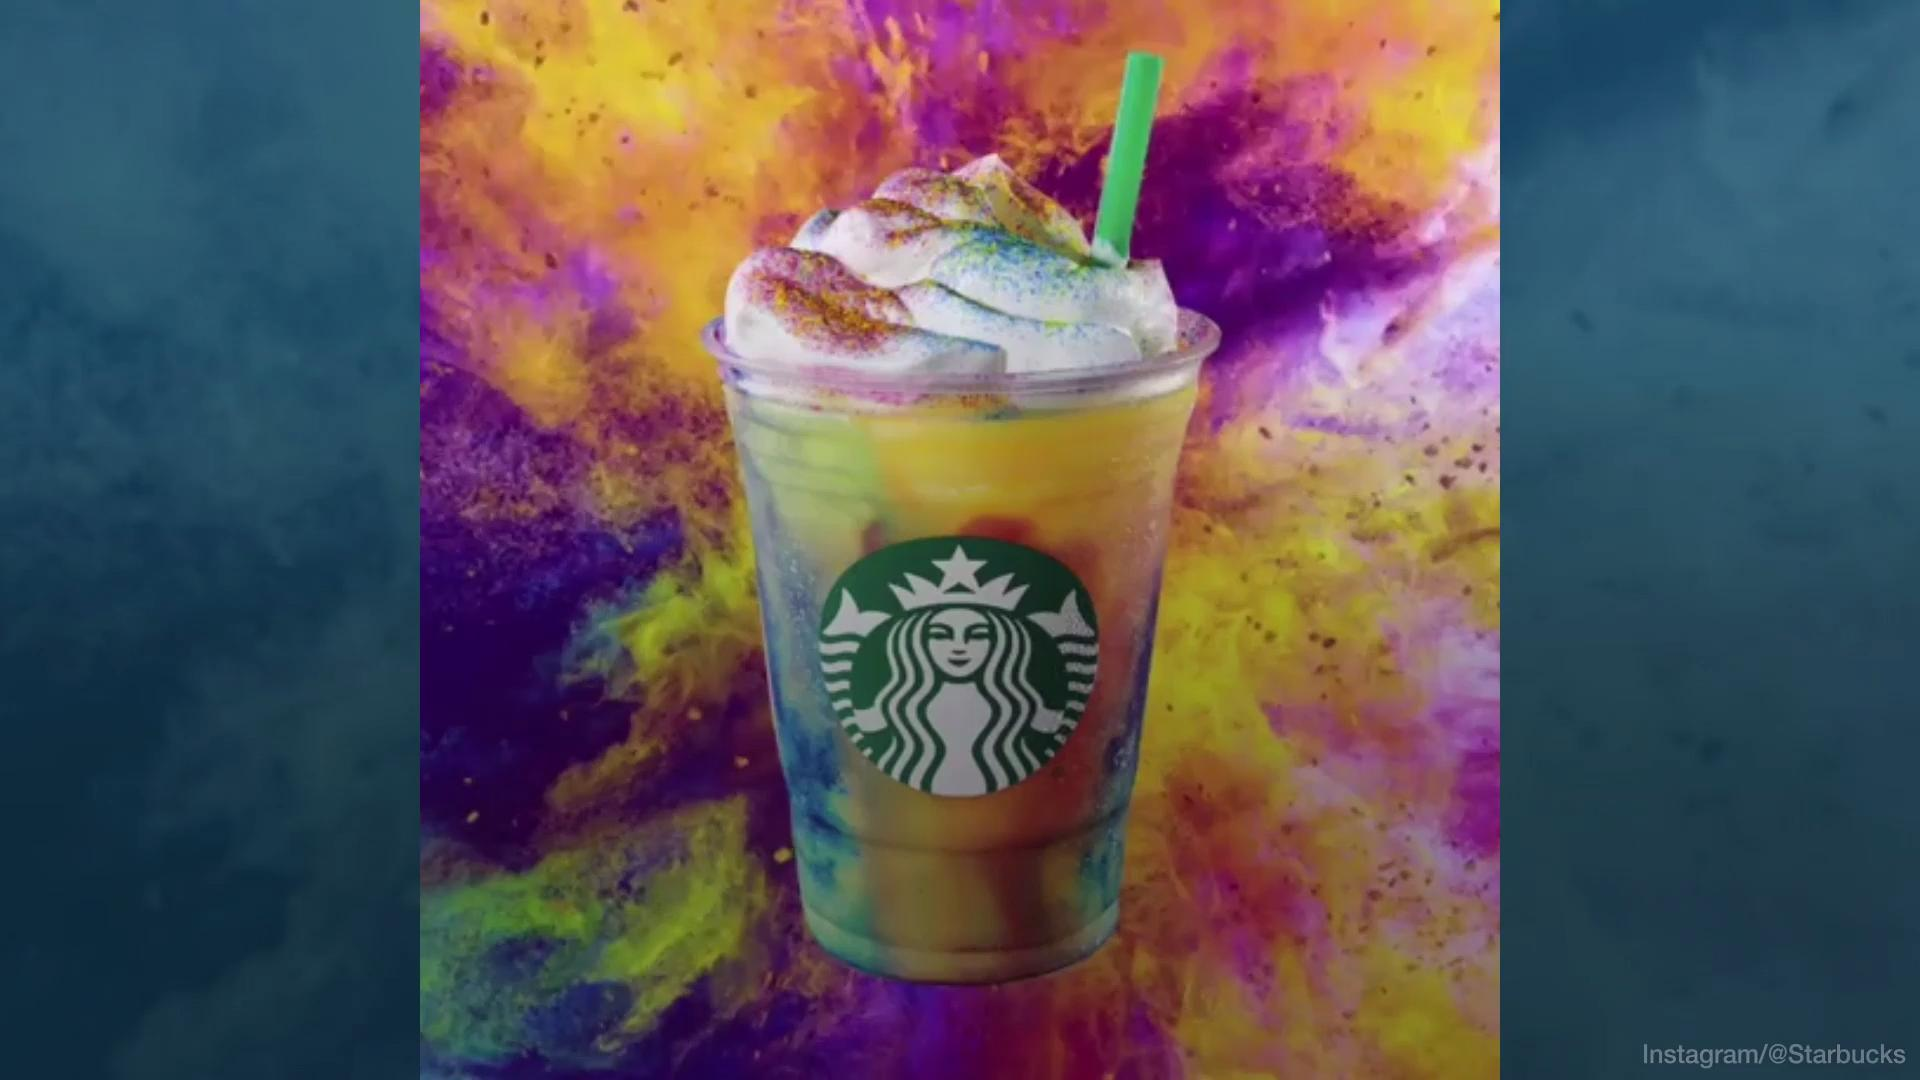 Starbucks Is Making Tie-Dye Frappuccinos | MyRecipes